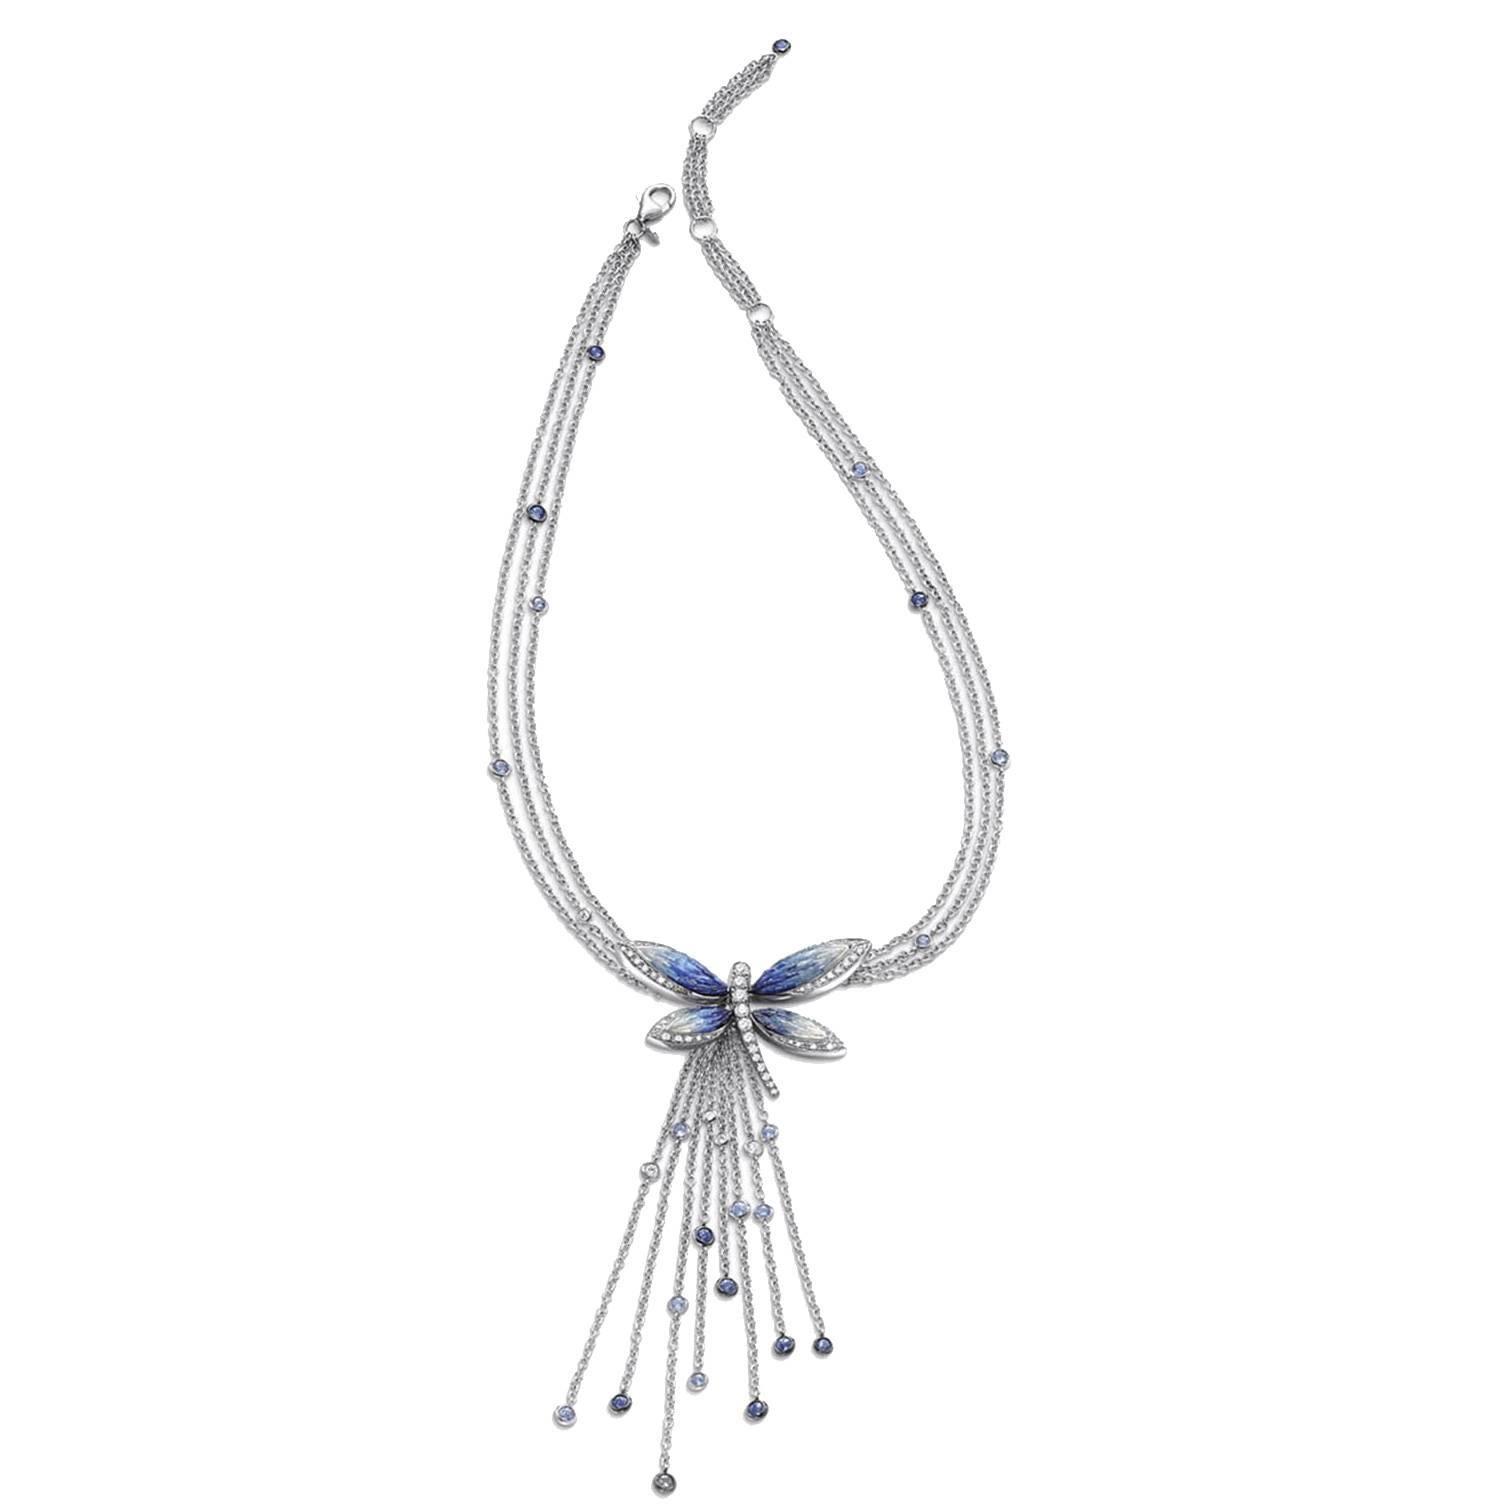 Stylish Necklace White Diamonds White Gold Sapphire Hand Decorated Micromosaic